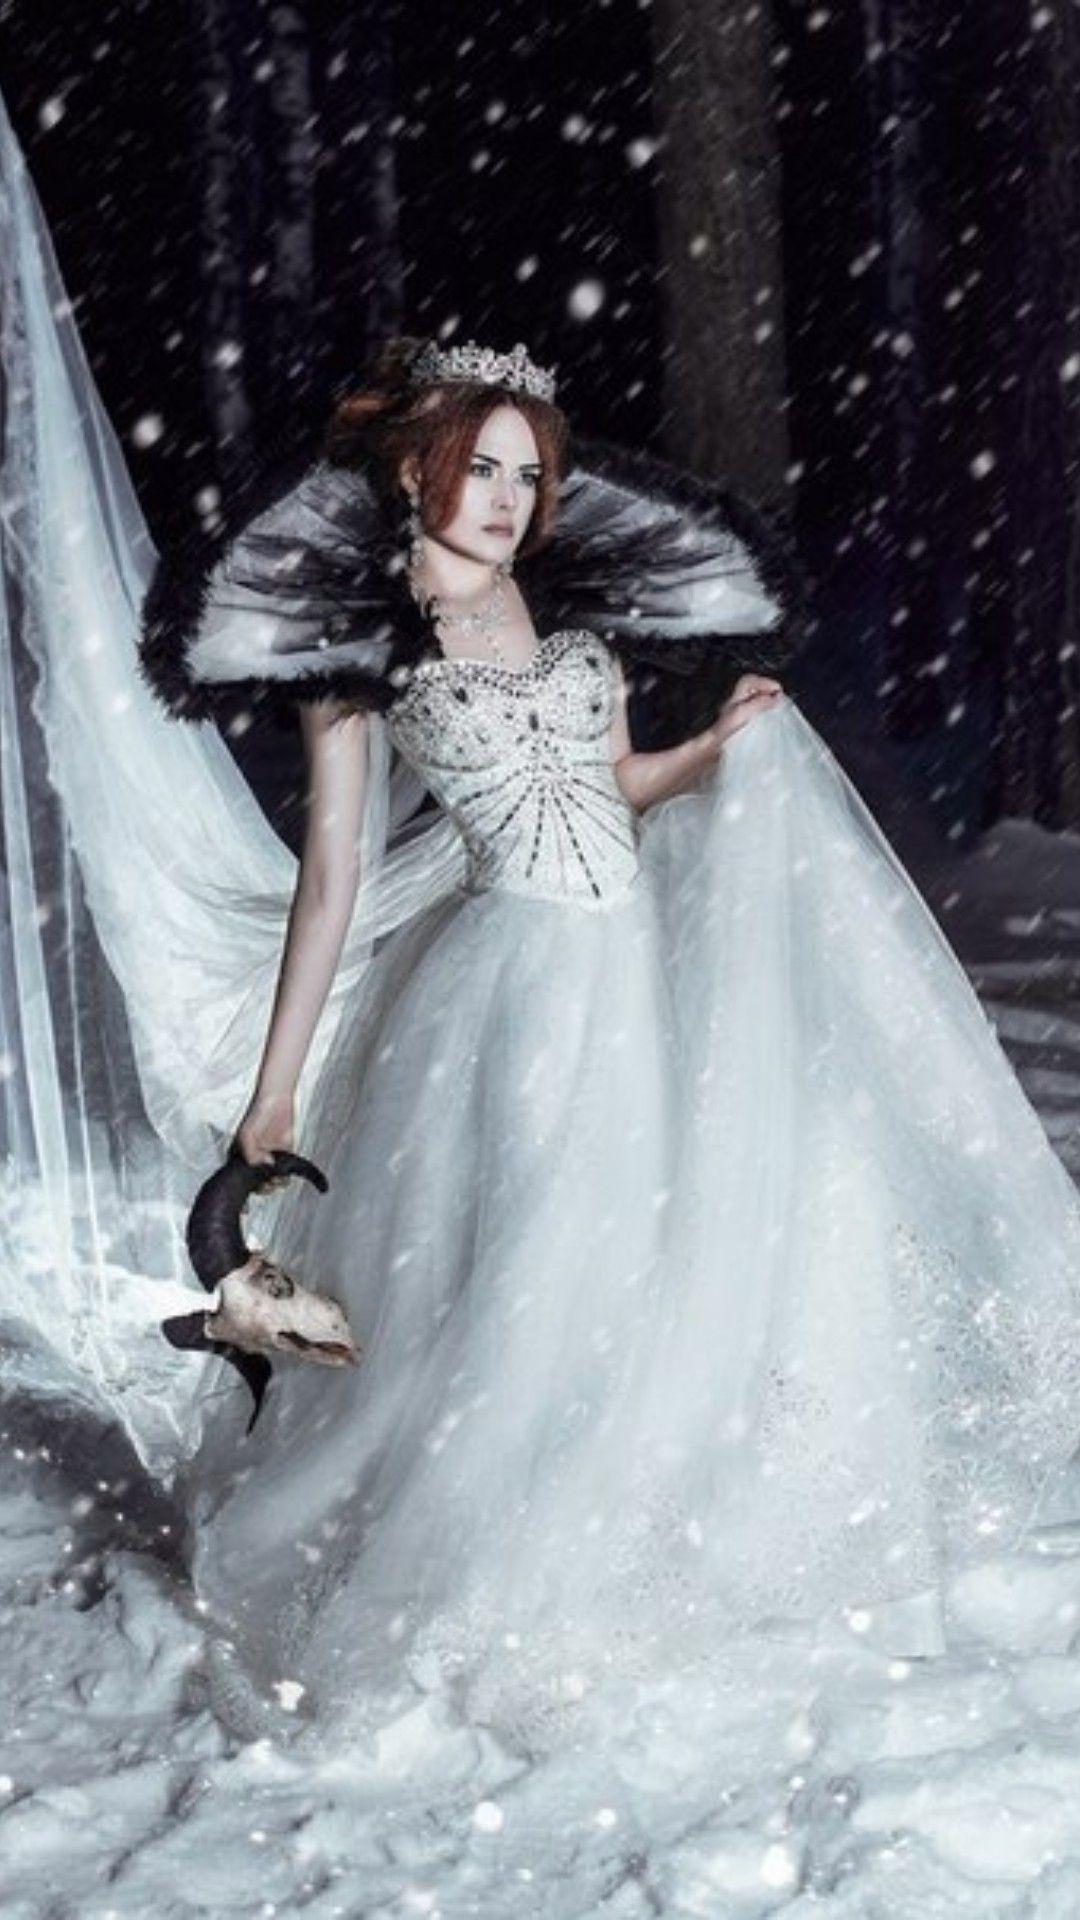 Pin by Spiro Sousanis on Gothic White   Pinterest   Gothic and Fashion